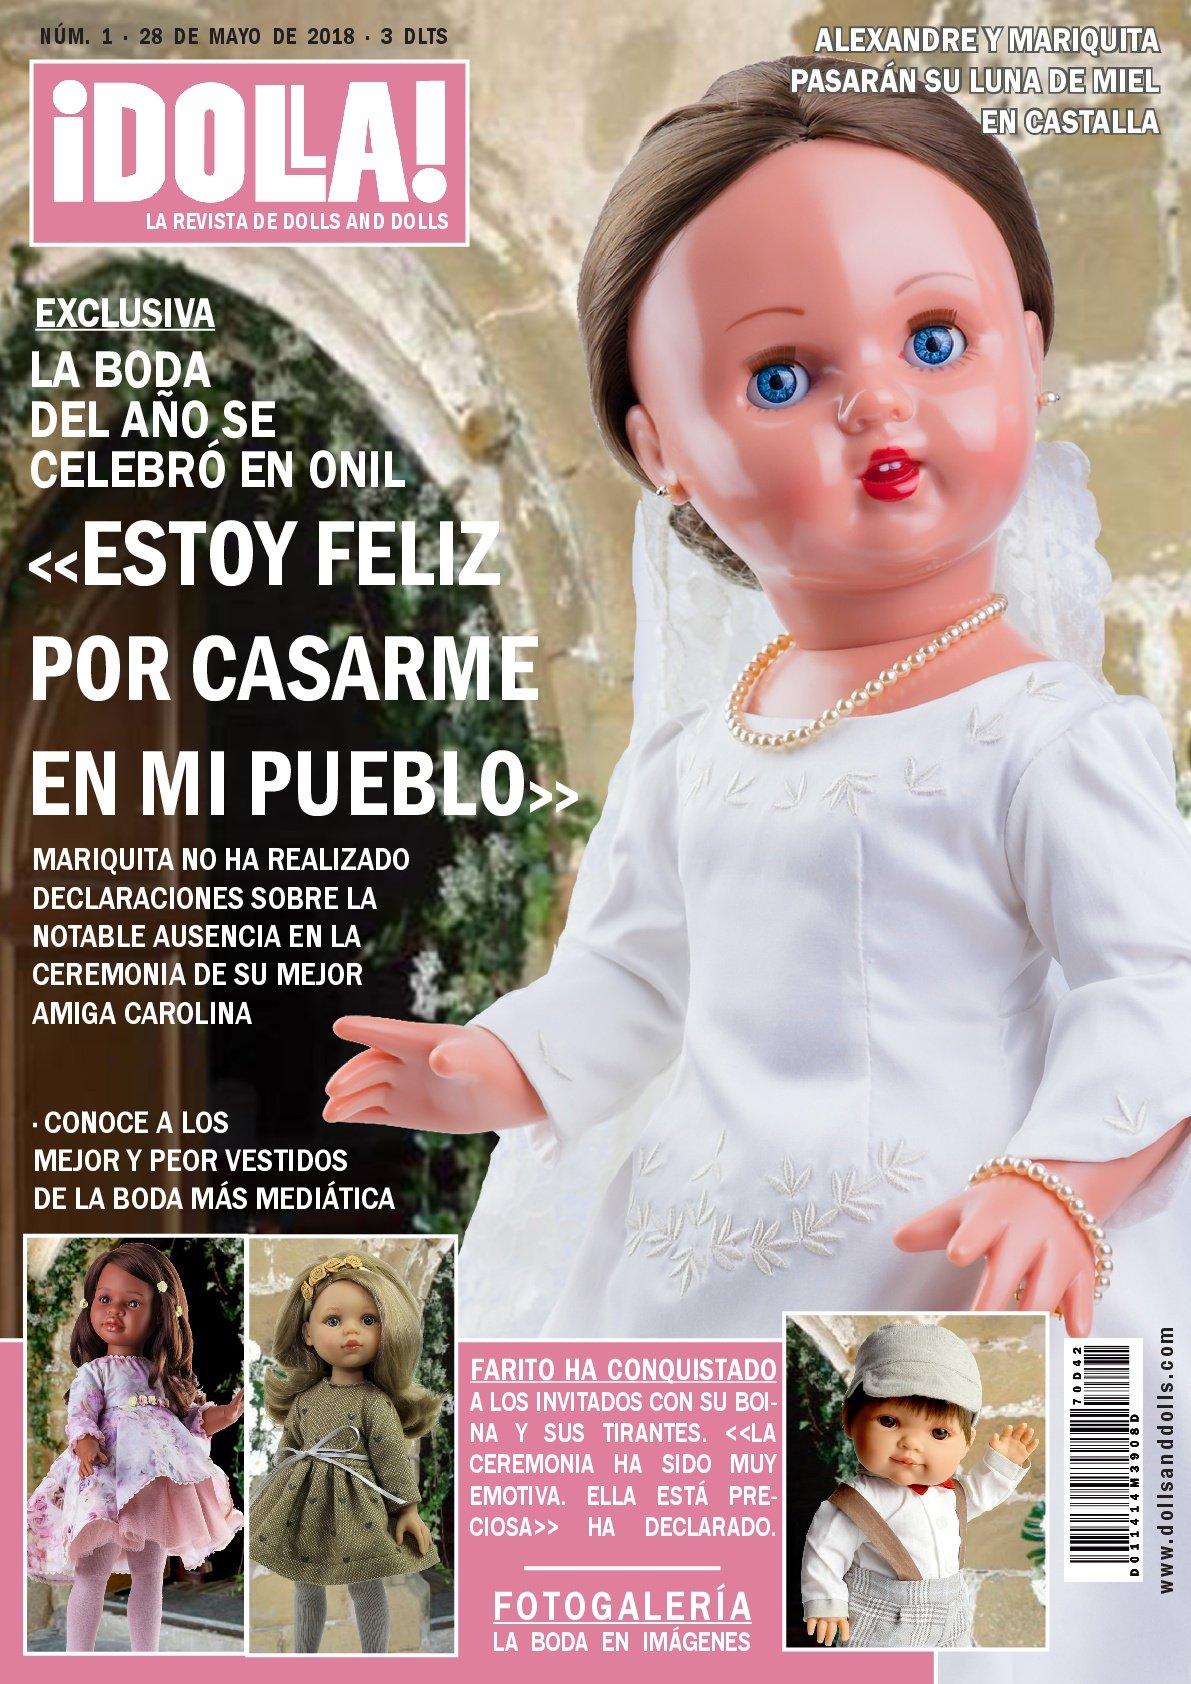 revista ¡dolla! junio 2018